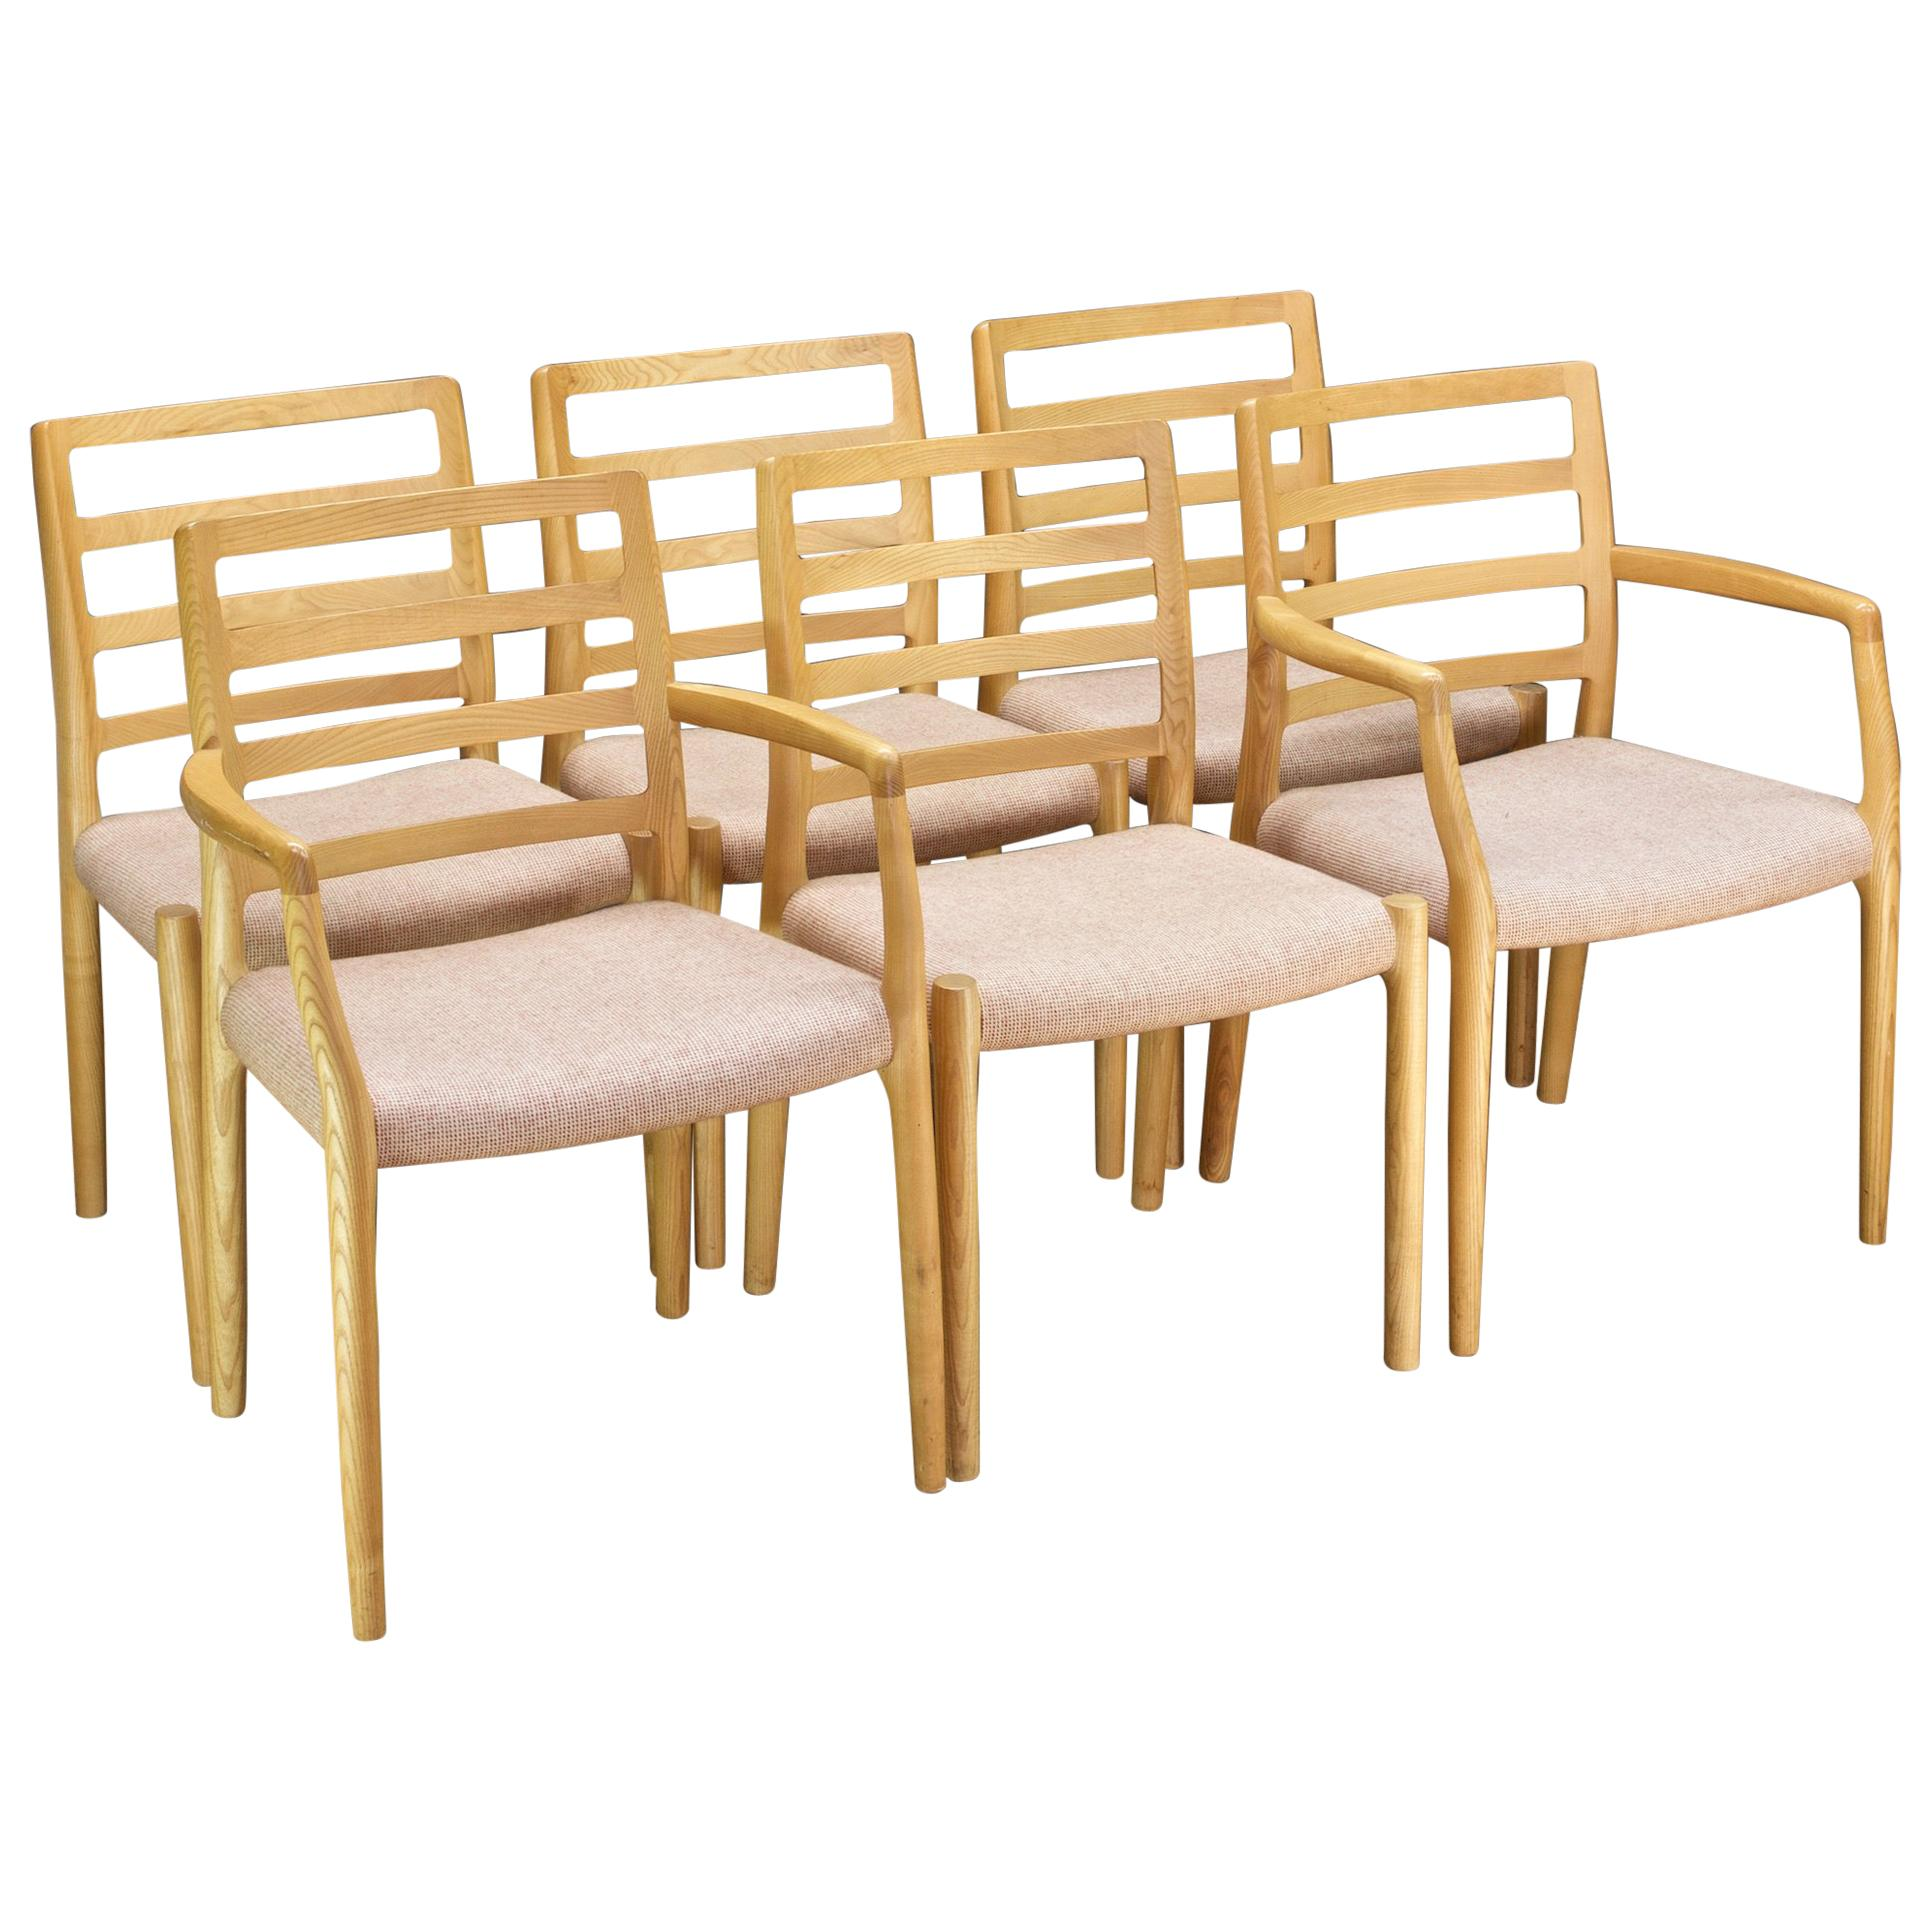 Scandinavian Vanilla Blonde Dining Chair Danish MidCentury Cabinmodern Farmhouse